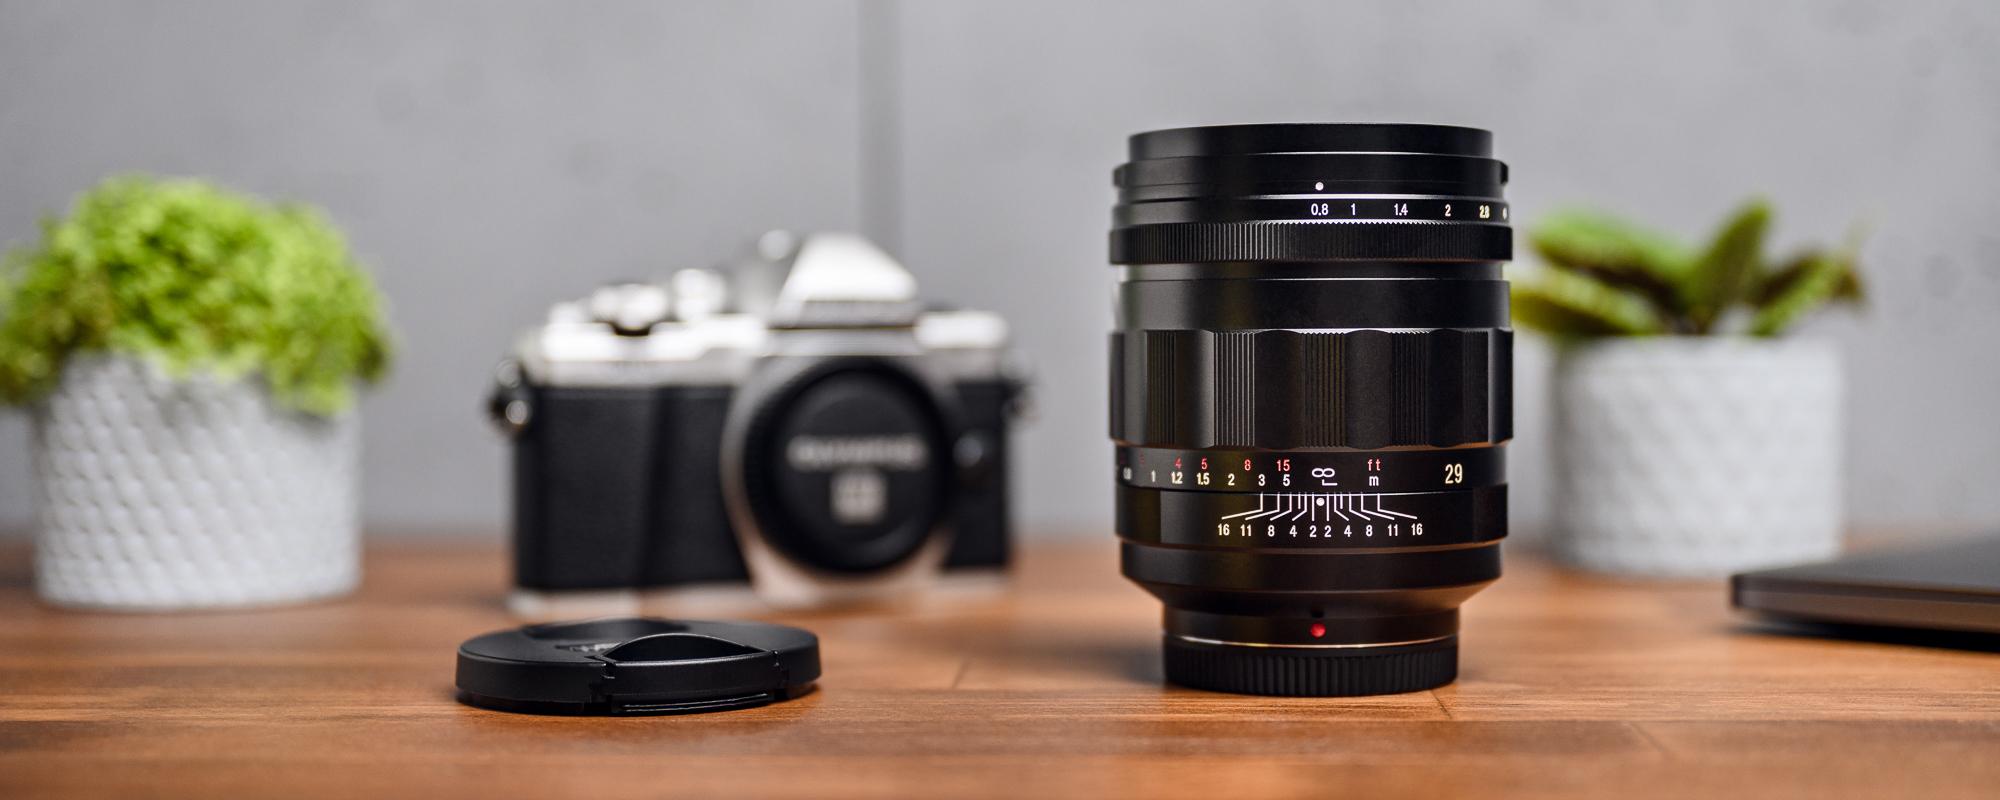 Voigtlander Super Nokton 29mm f/0.8 lens for Micro 4/3 - ready for action